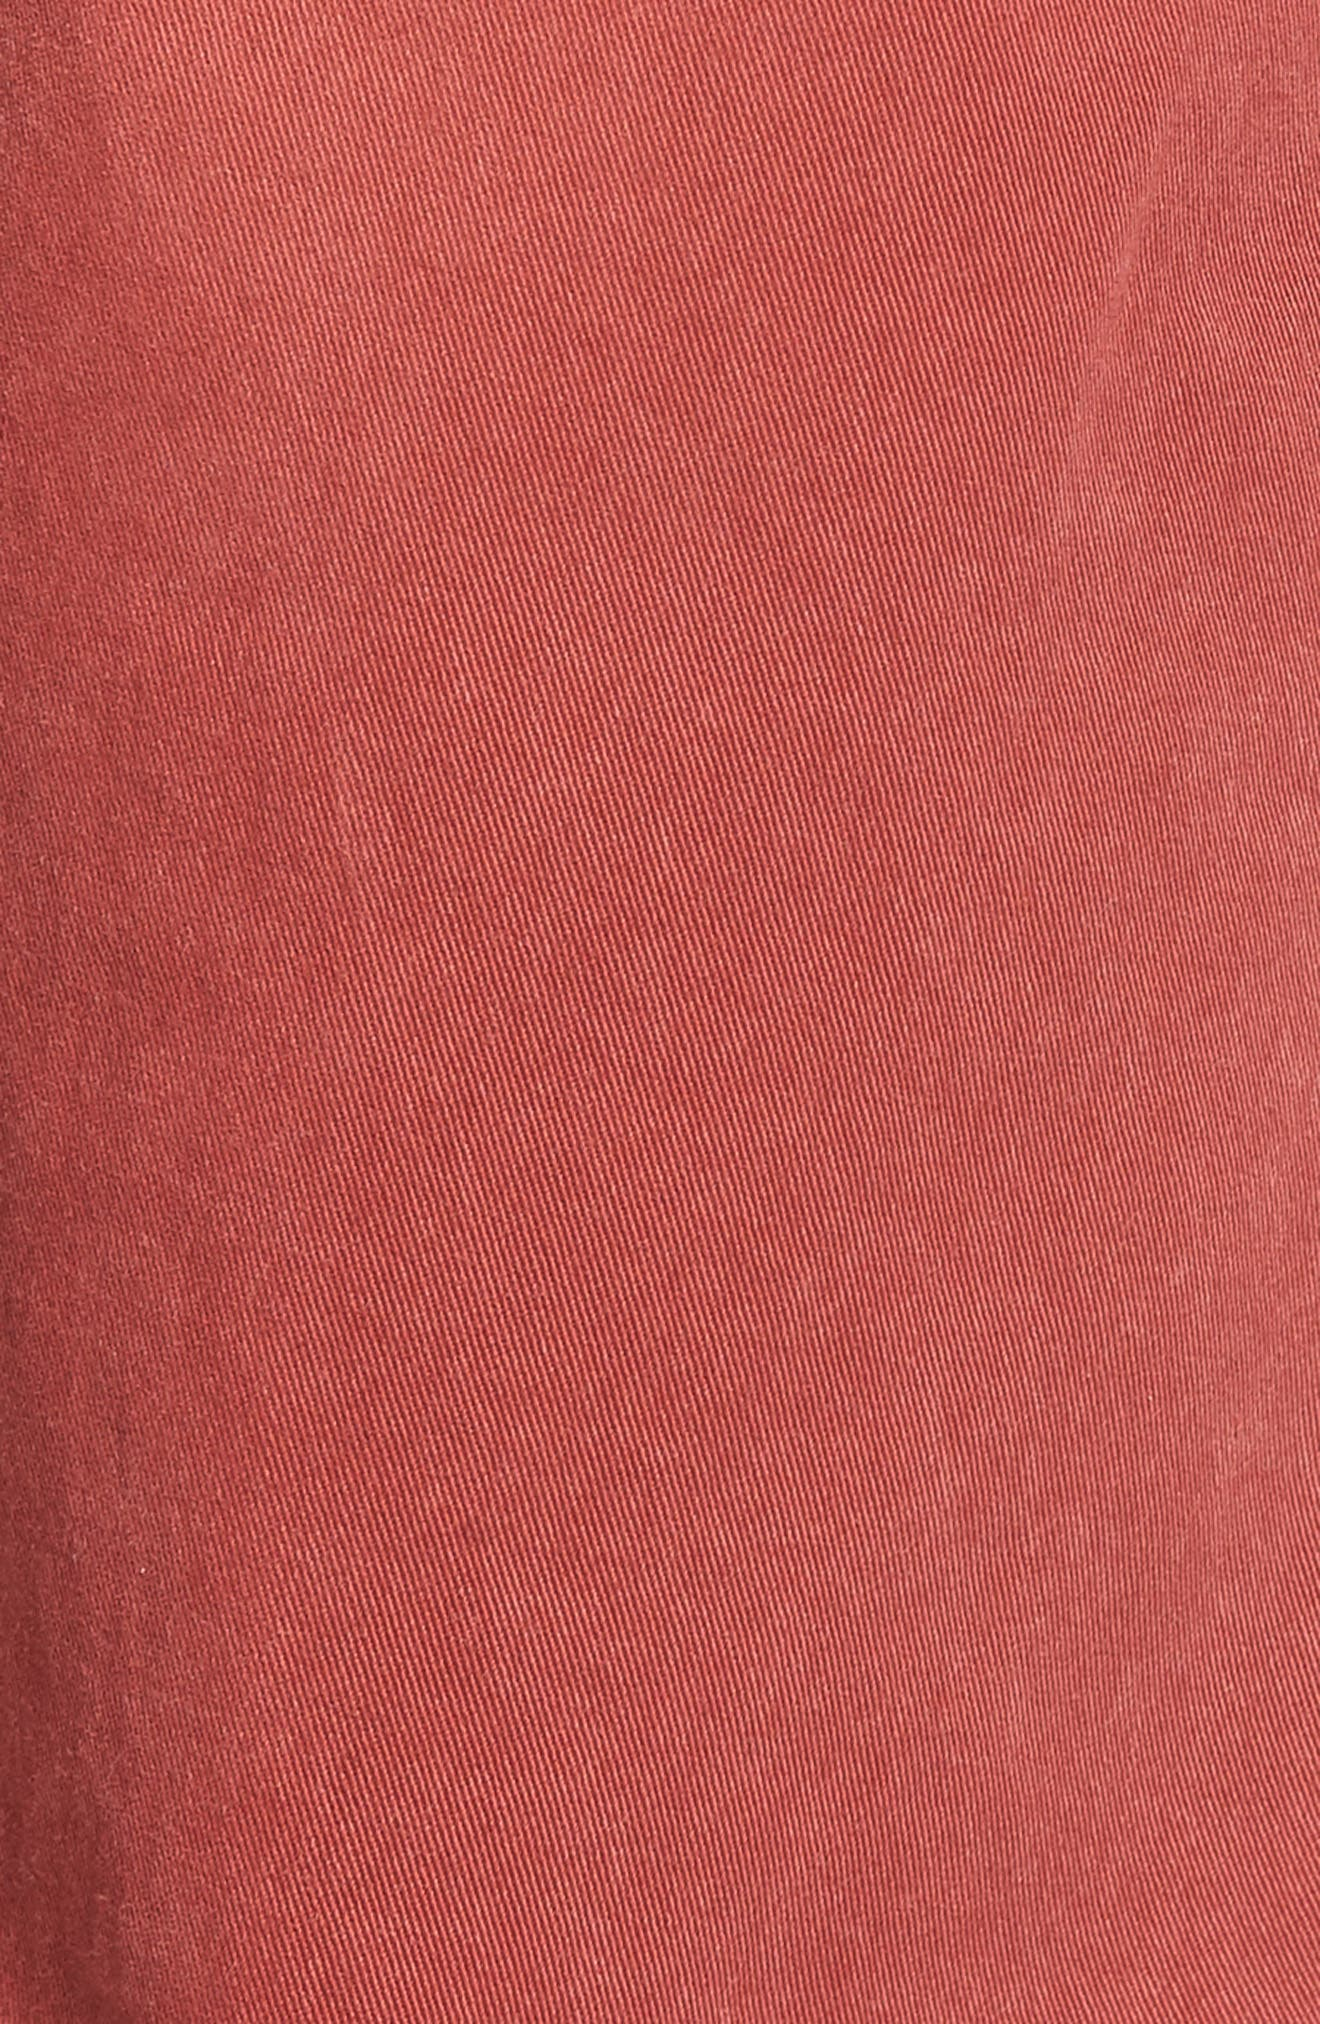 Tyler Slim Fit Jeans,                             Alternate thumbnail 30, color,